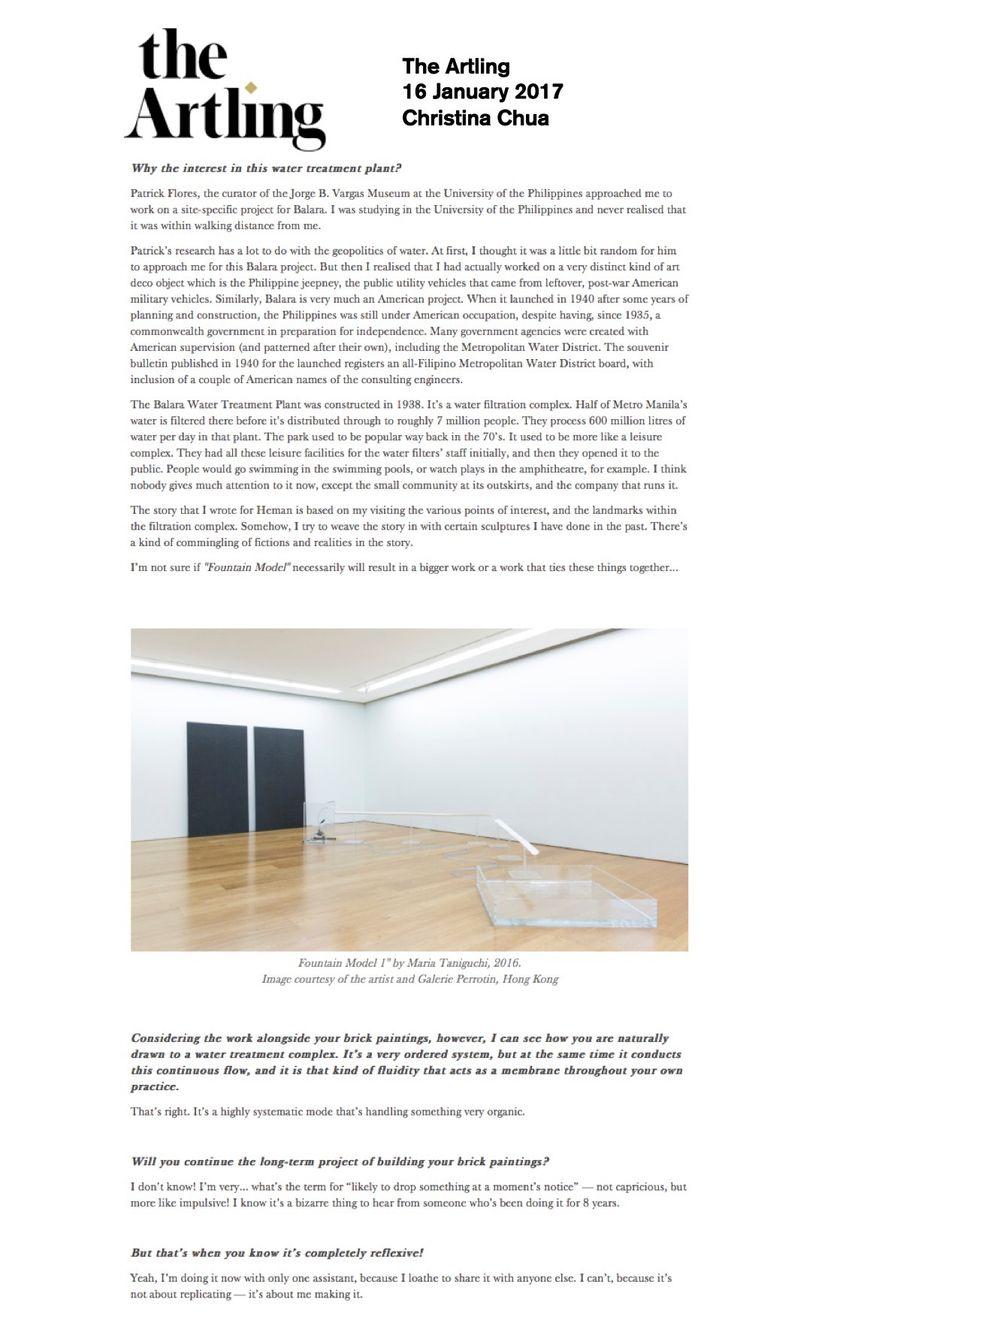 The Artling | Maria TANIGUCHI